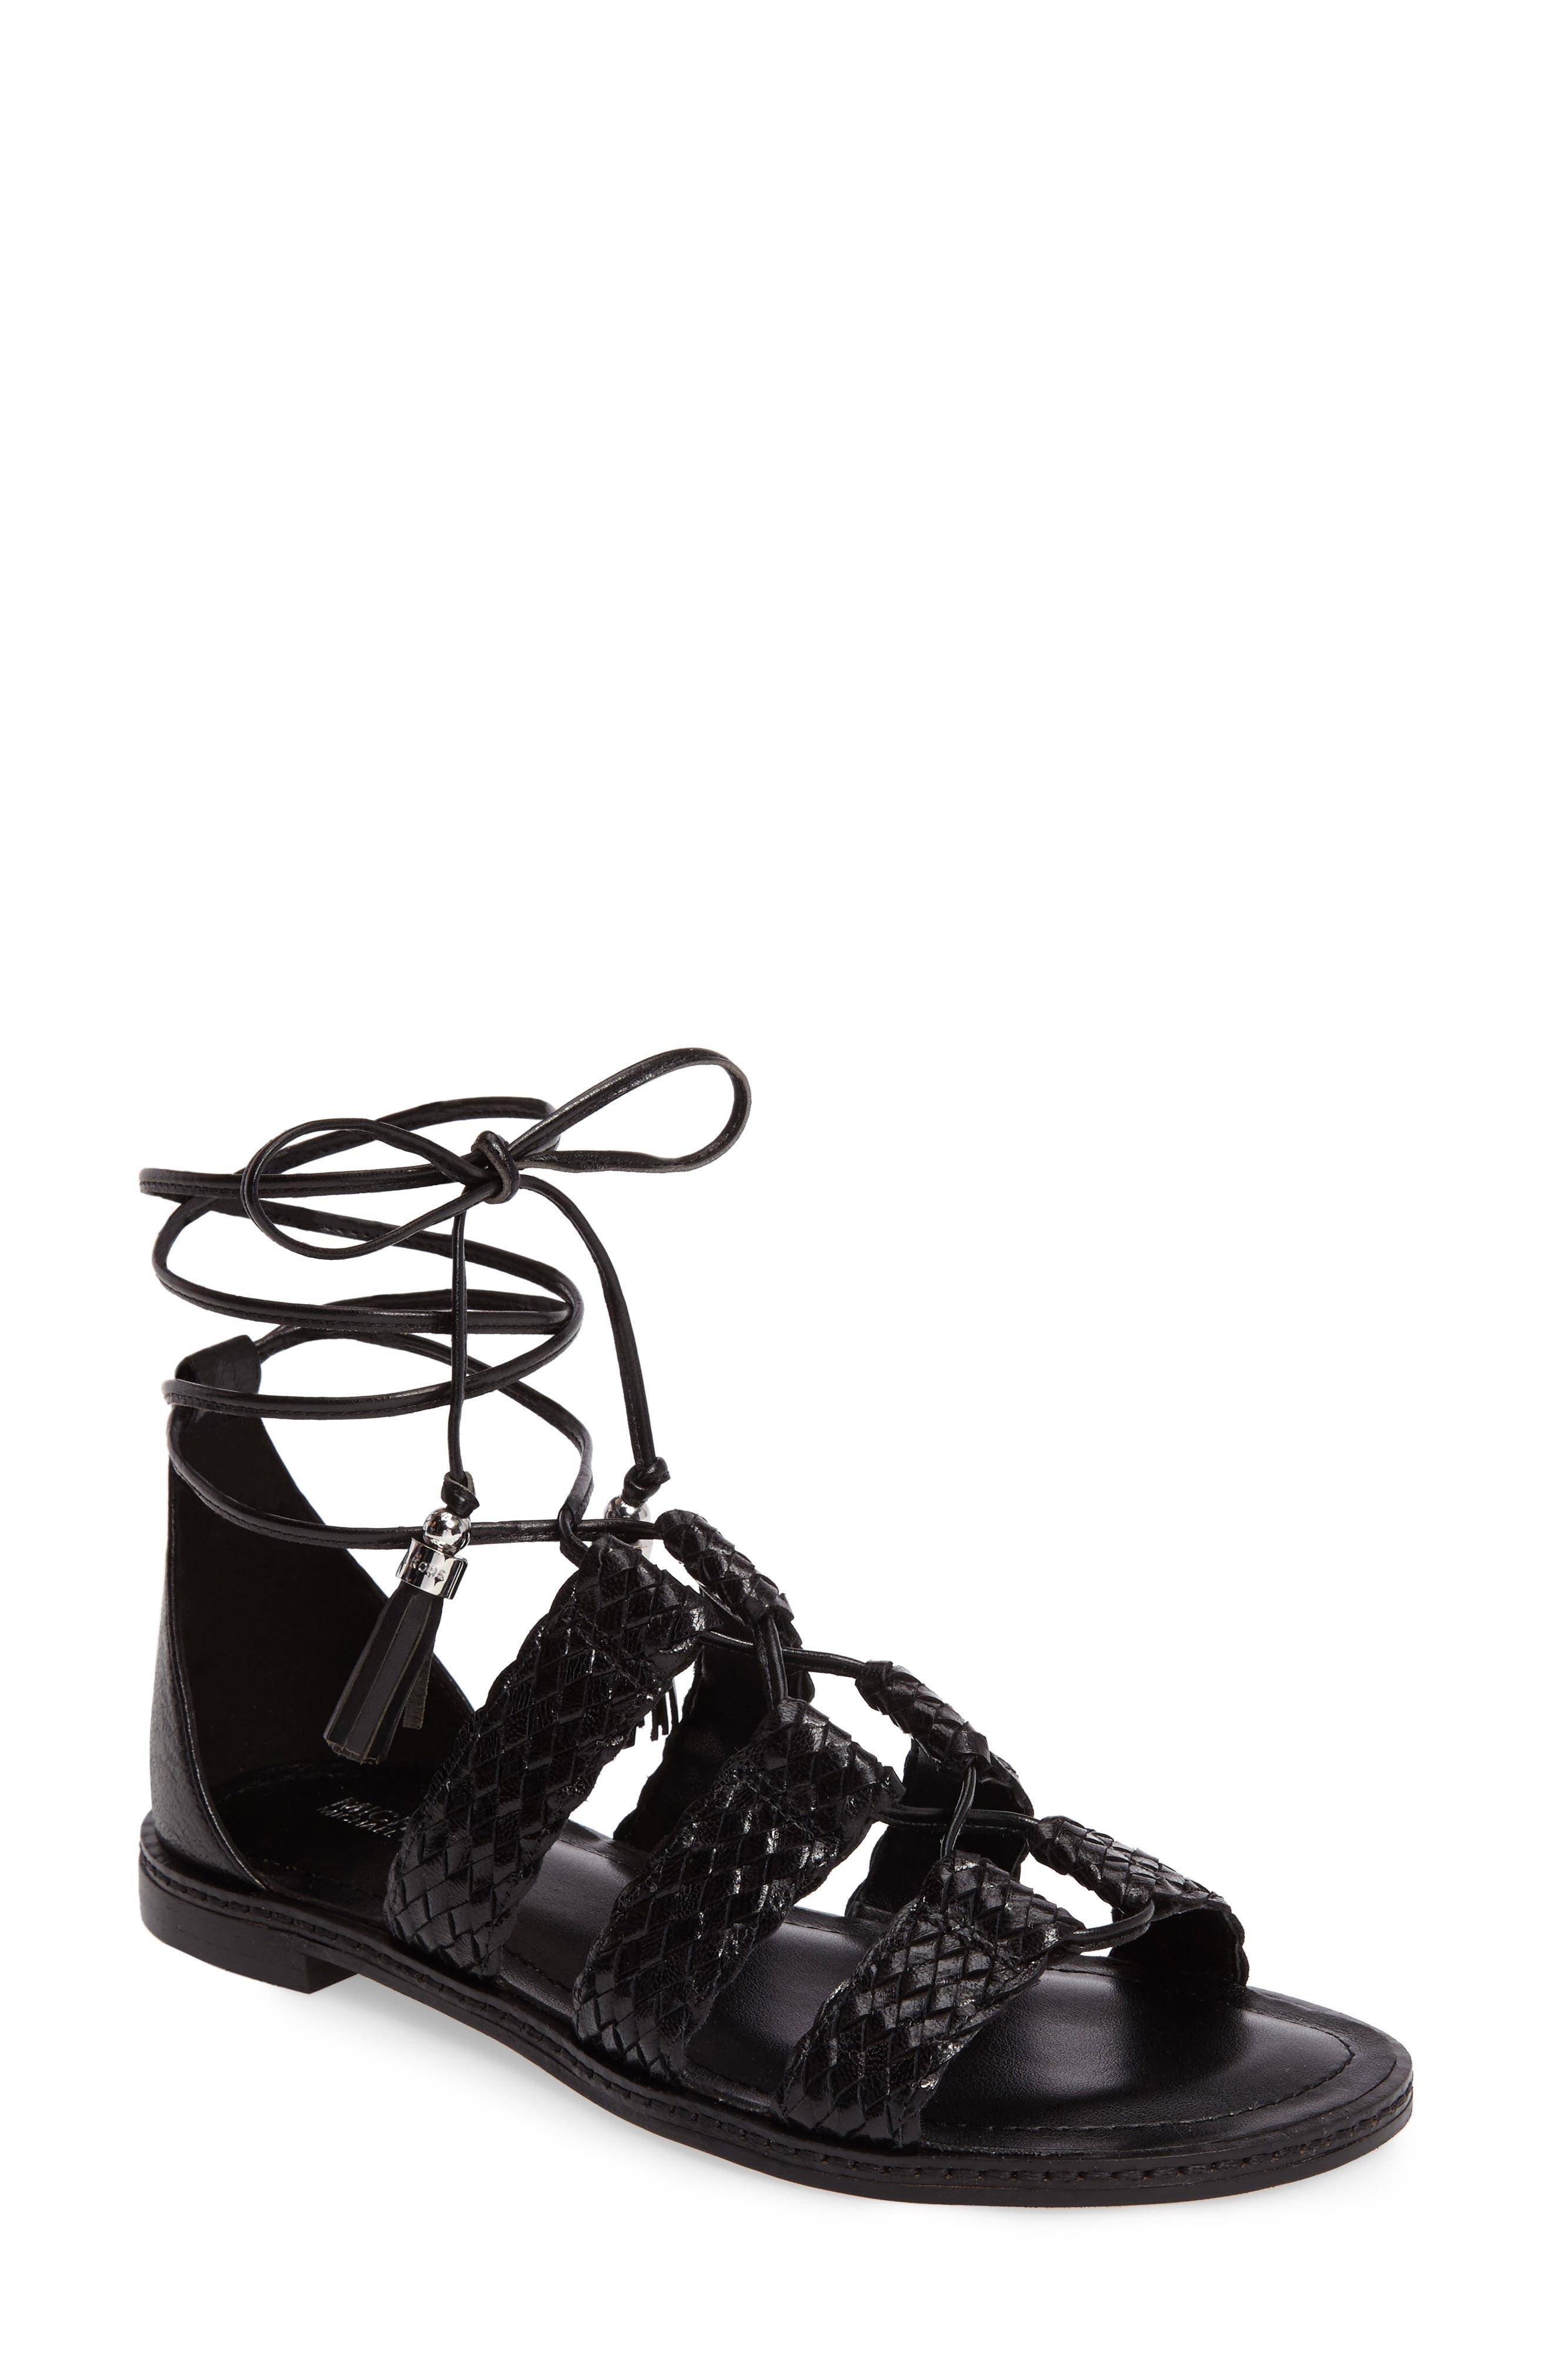 Monterey Lace-Up Gladiator Sandal,                         Main,                         color, 001